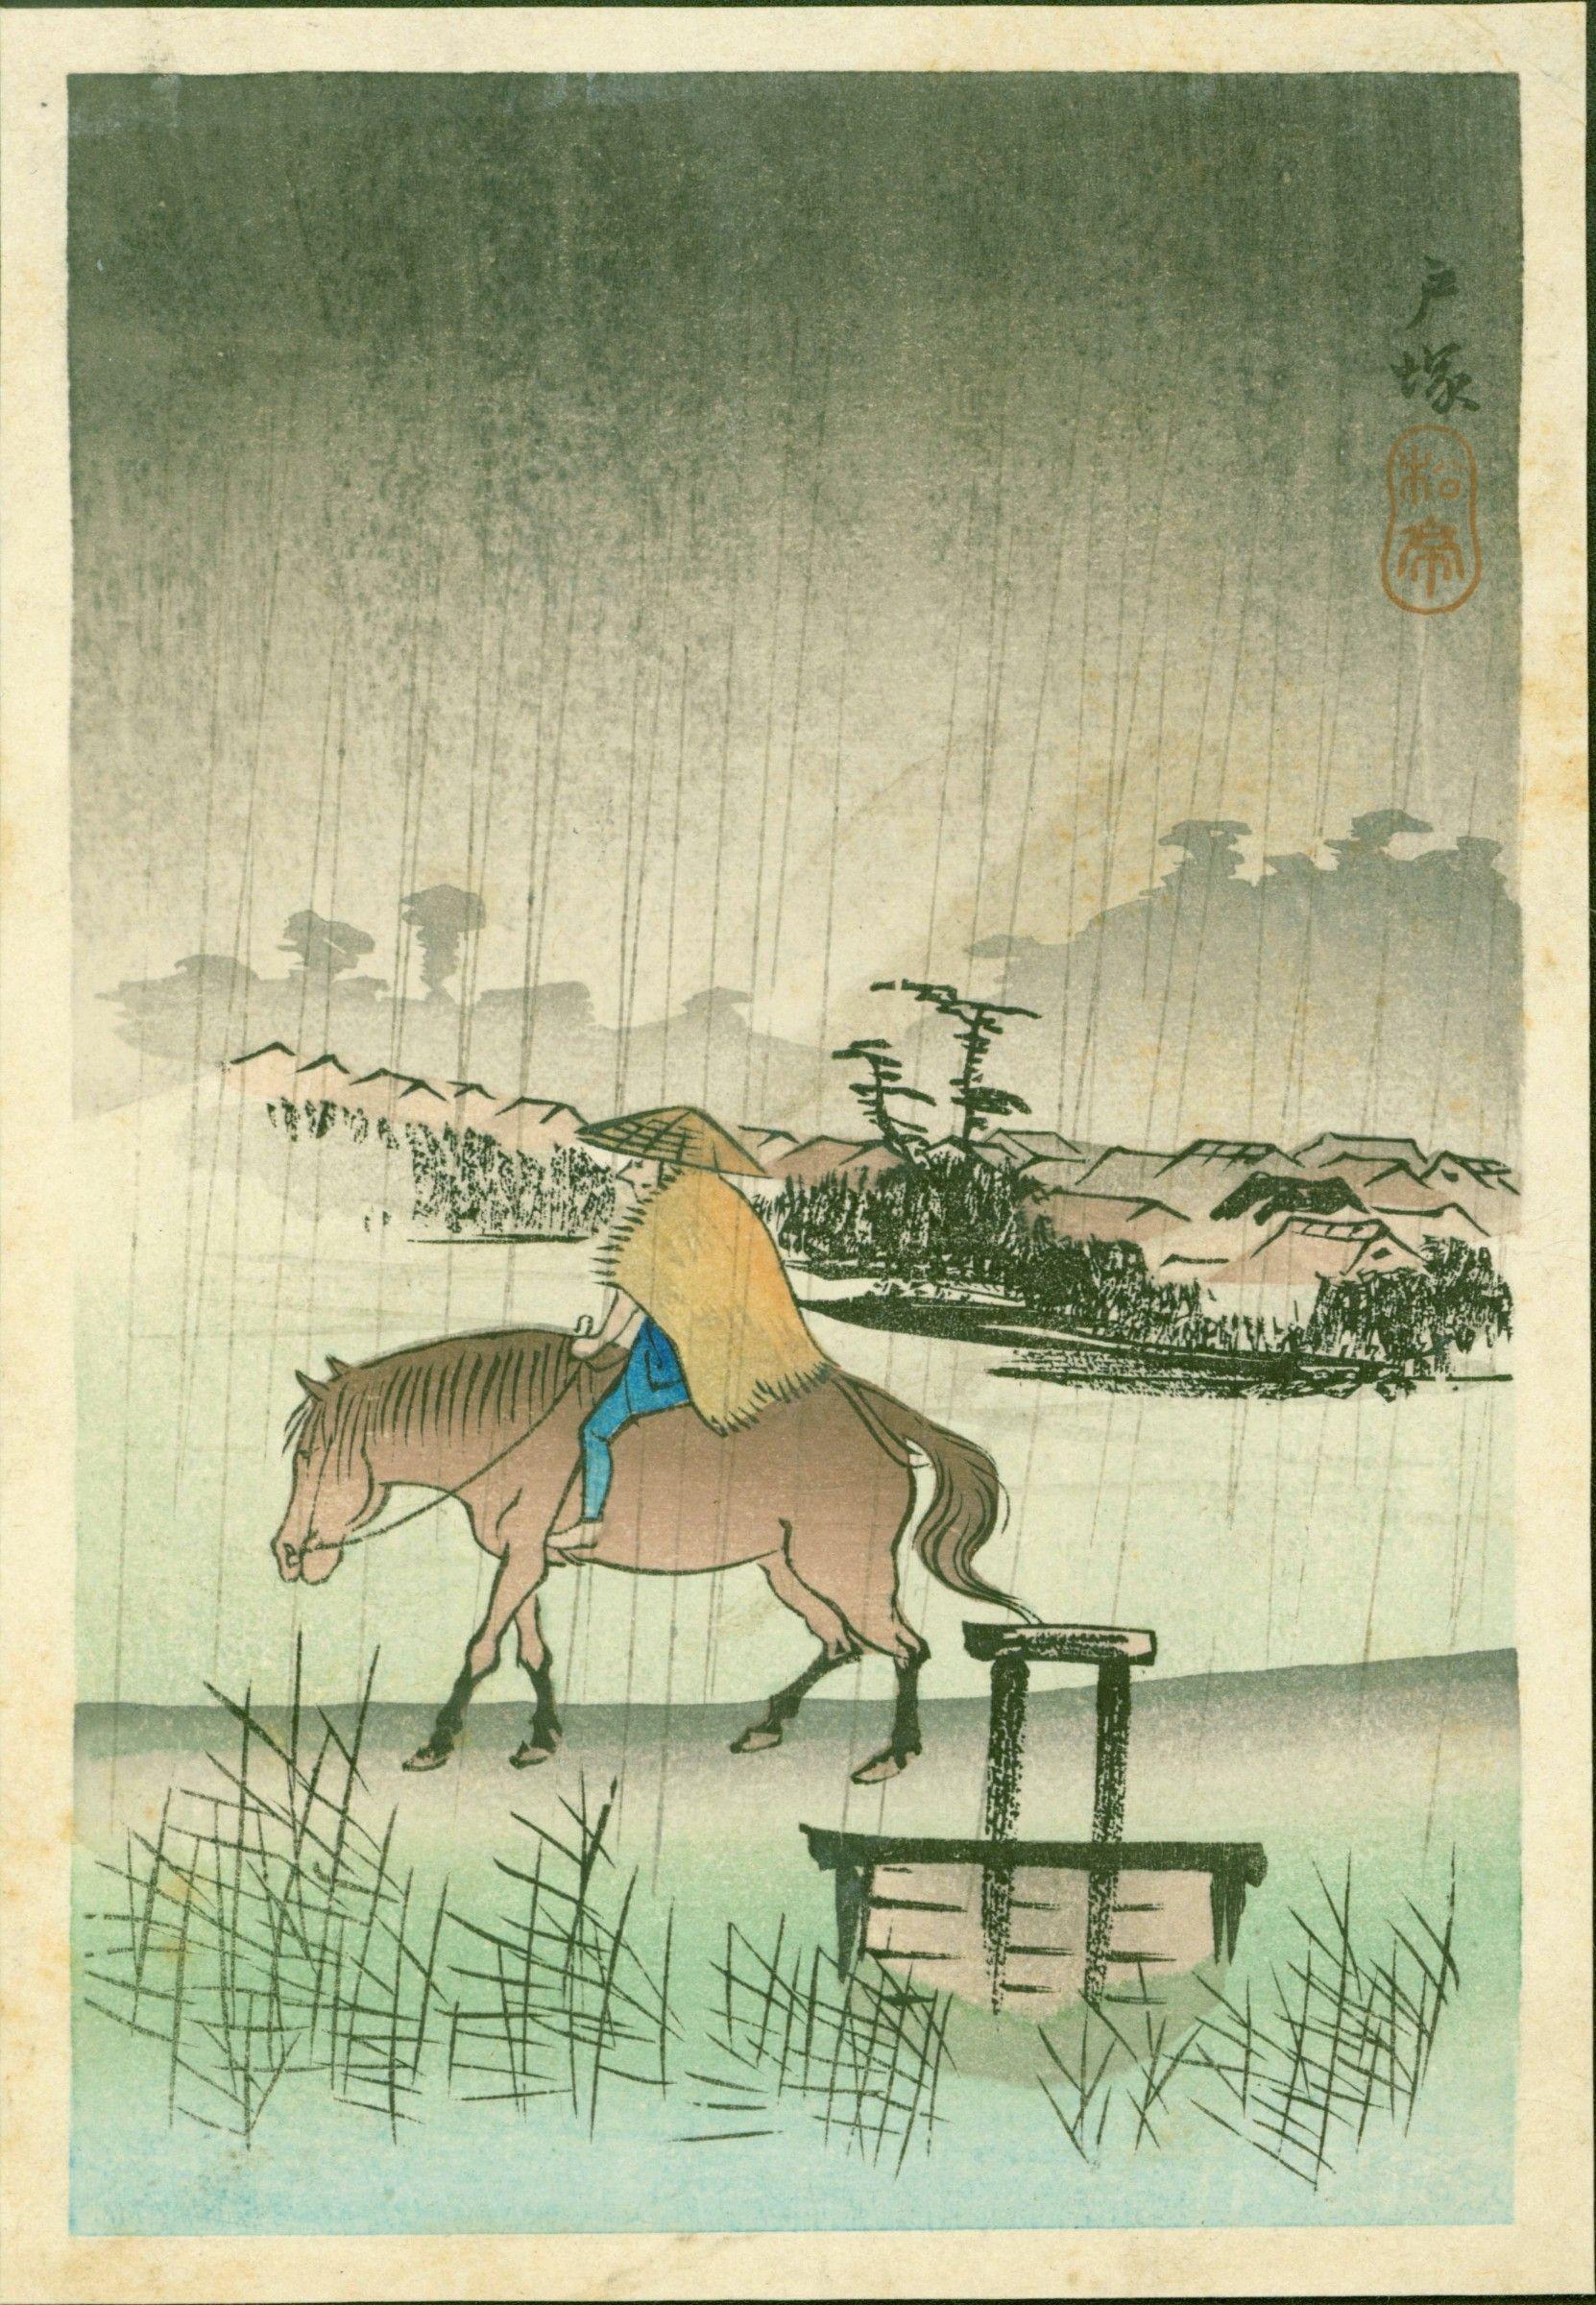 Takahashi Shotei Pre-Quake Woodblock Print - Totsuka - Prev. Unknown